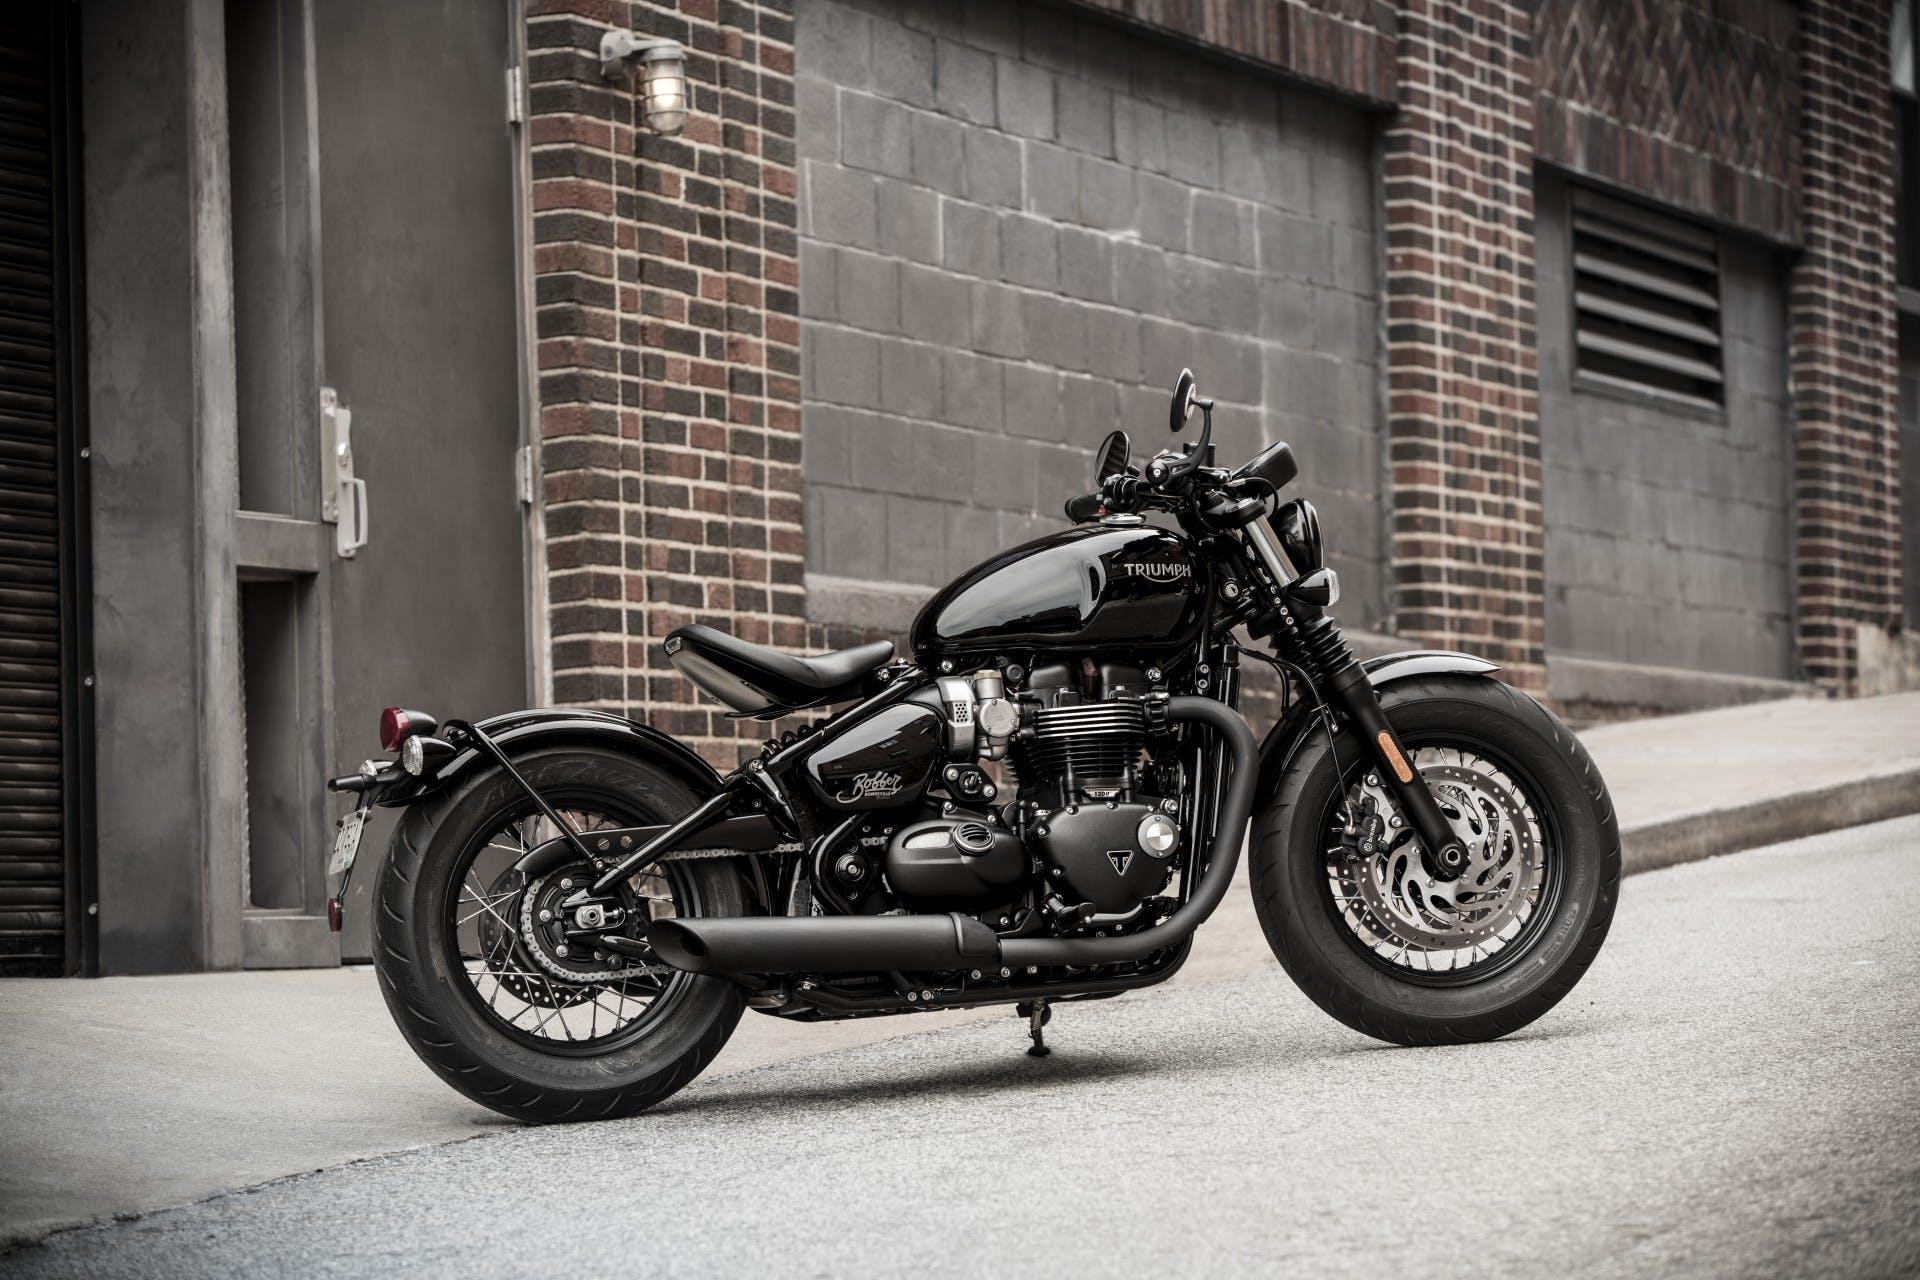 moto triumph bonneville bobber black, vista laterale ambientata